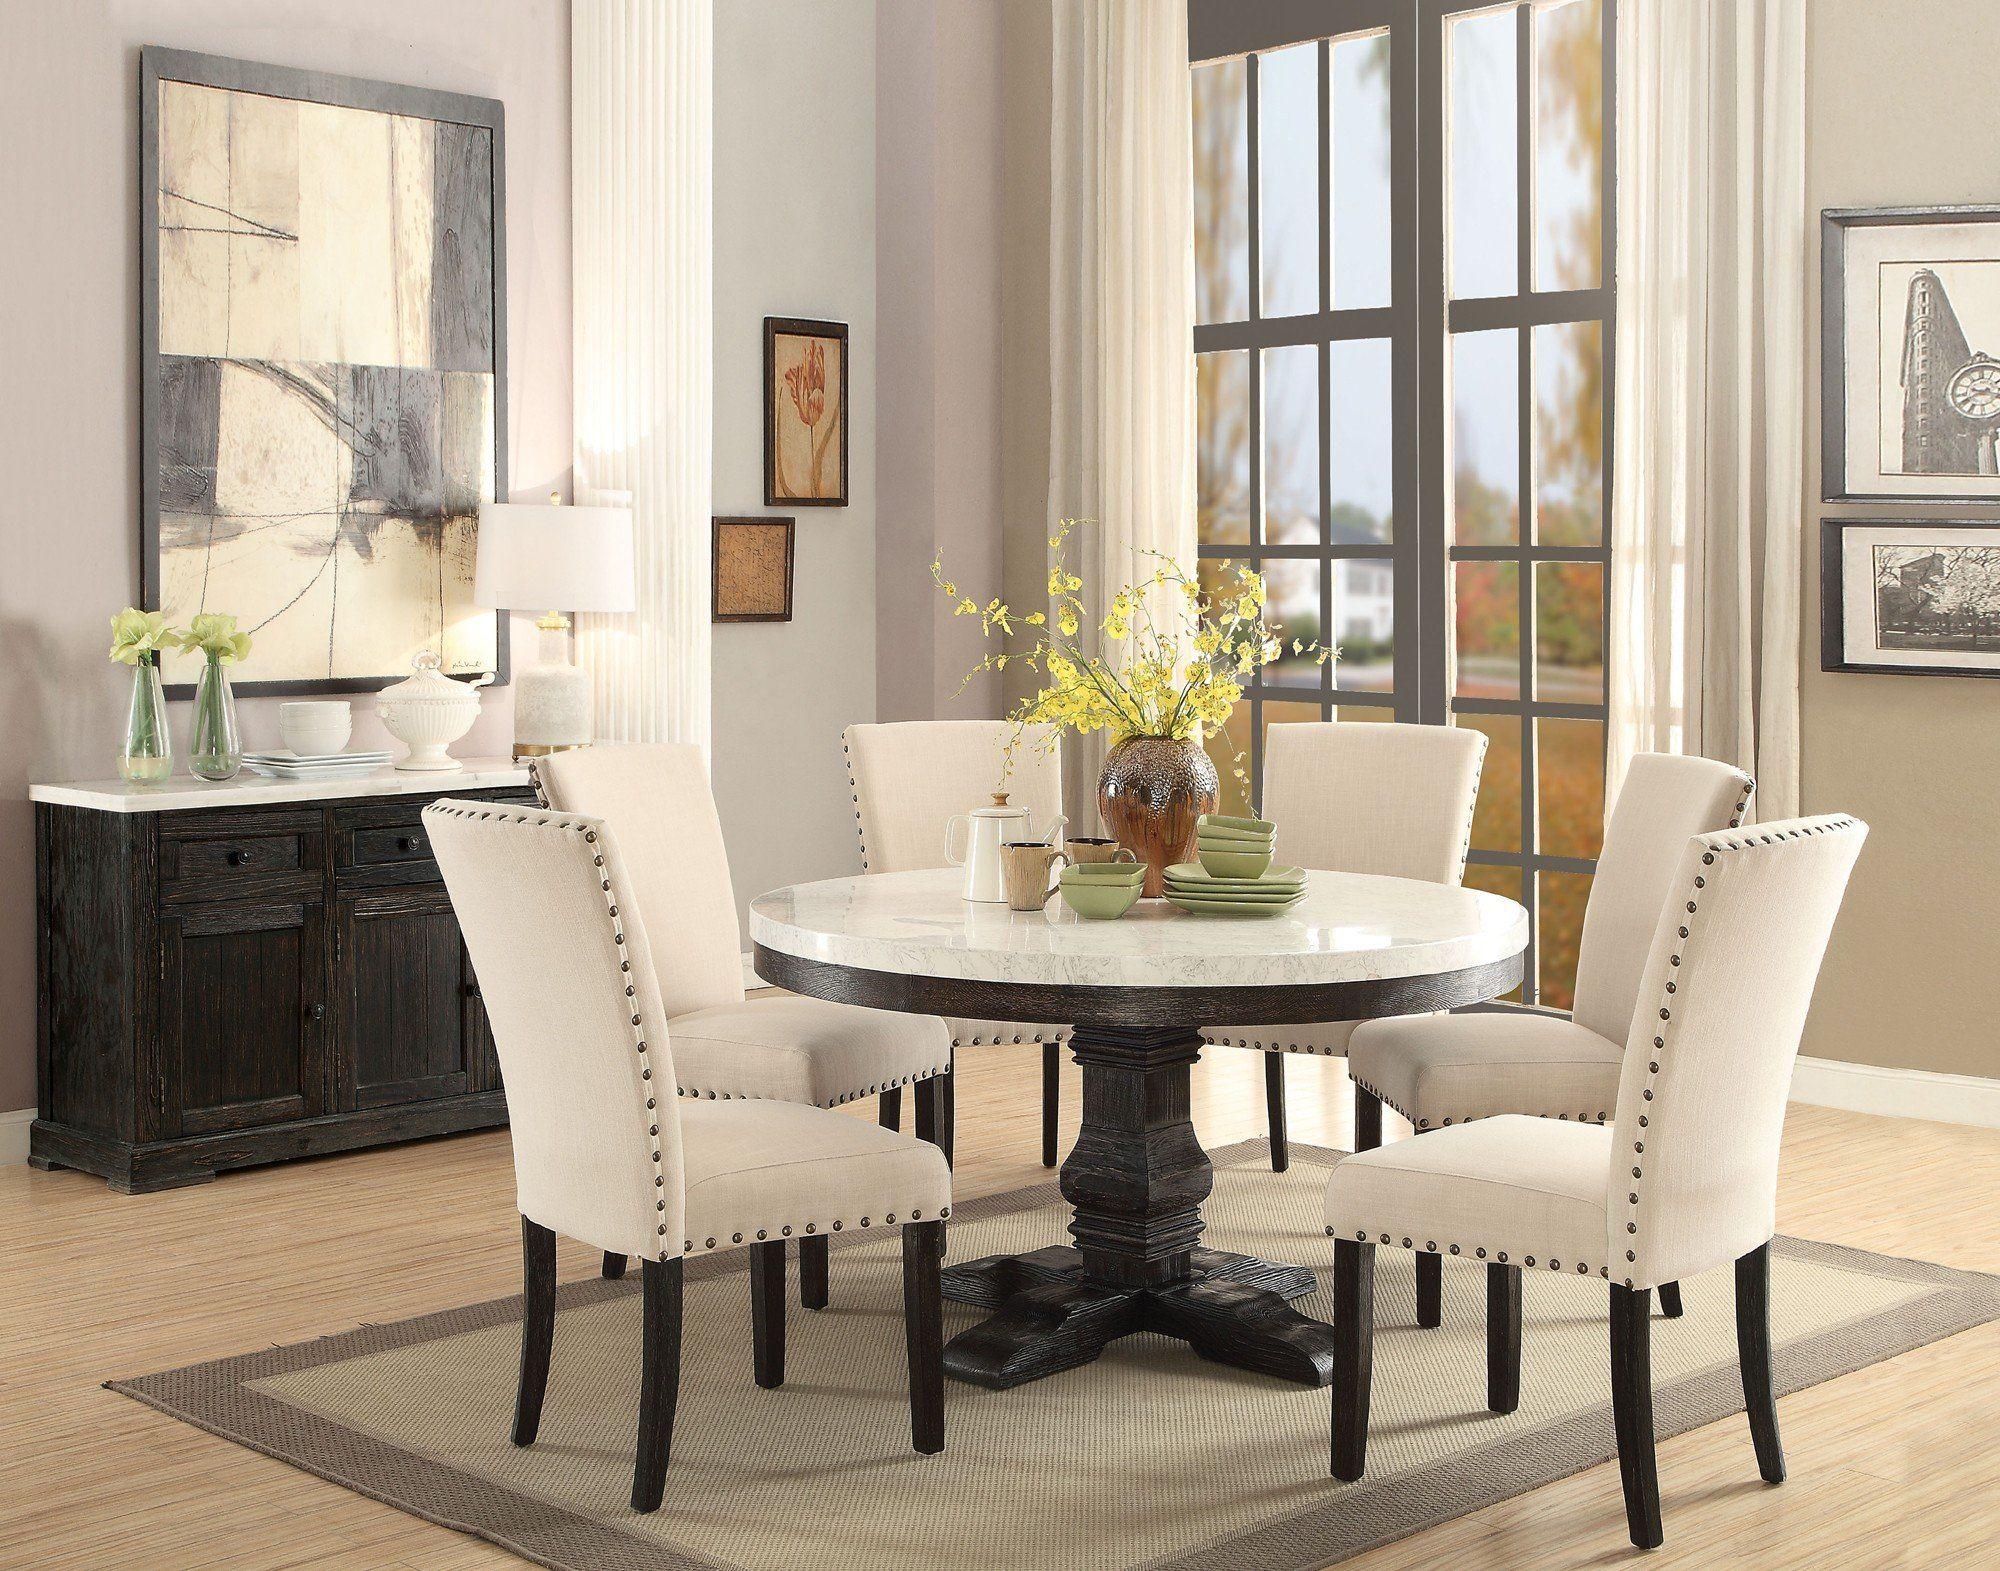 Acme 72845 Nolan 5Pcs White Marble Top Round Dining Table Set ...